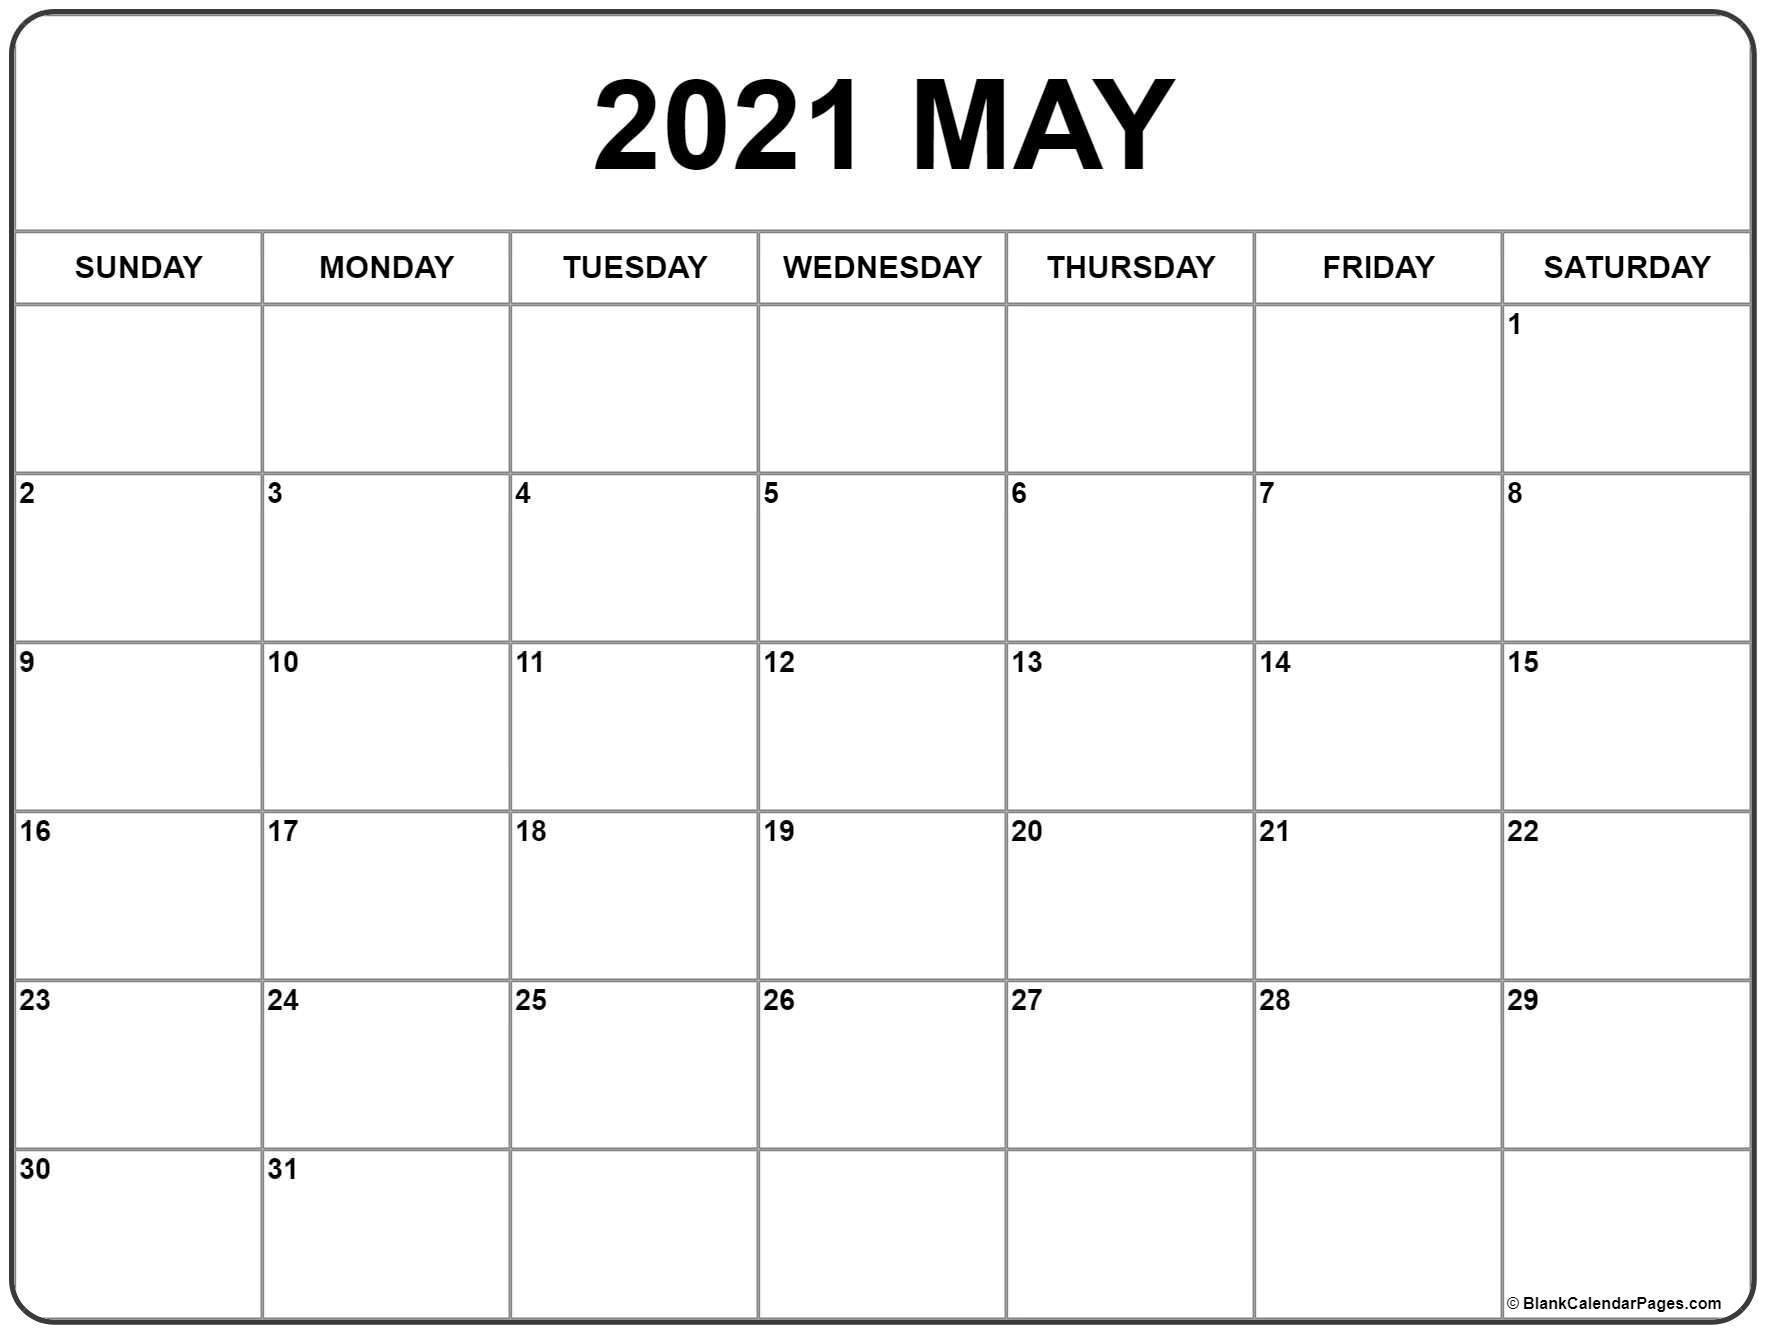 Get Free Printable Calendar 2021